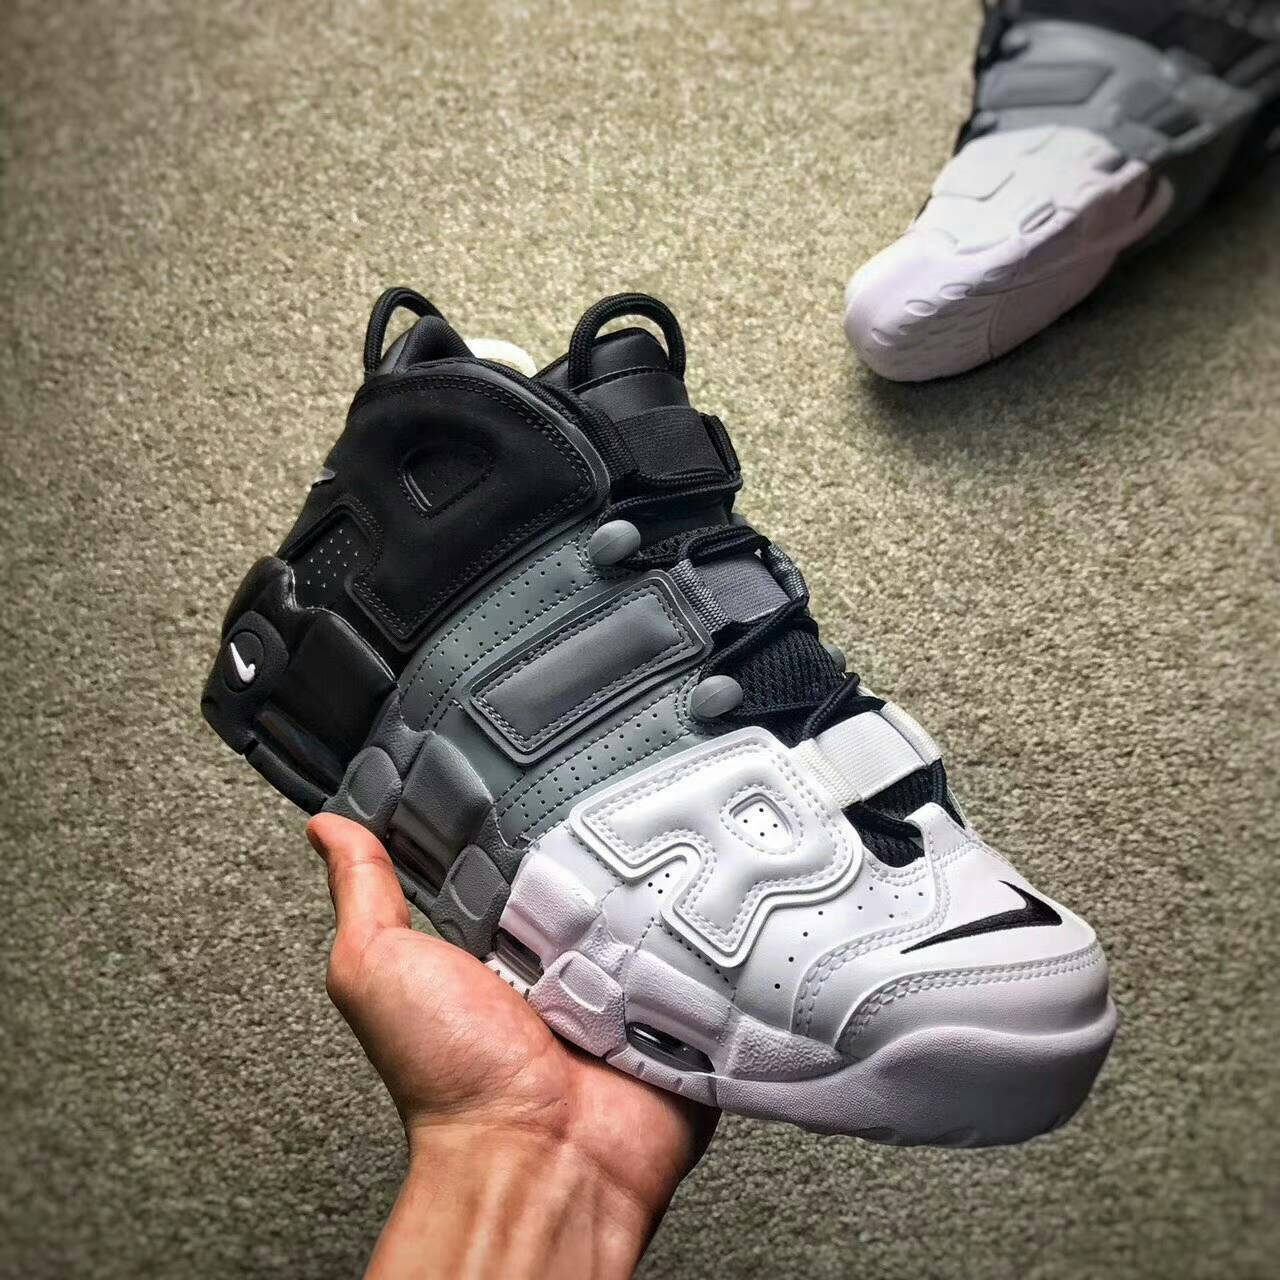 Nike Air More Uptempo Pippen 大AIR黑灰漸變籃球鞋 男款